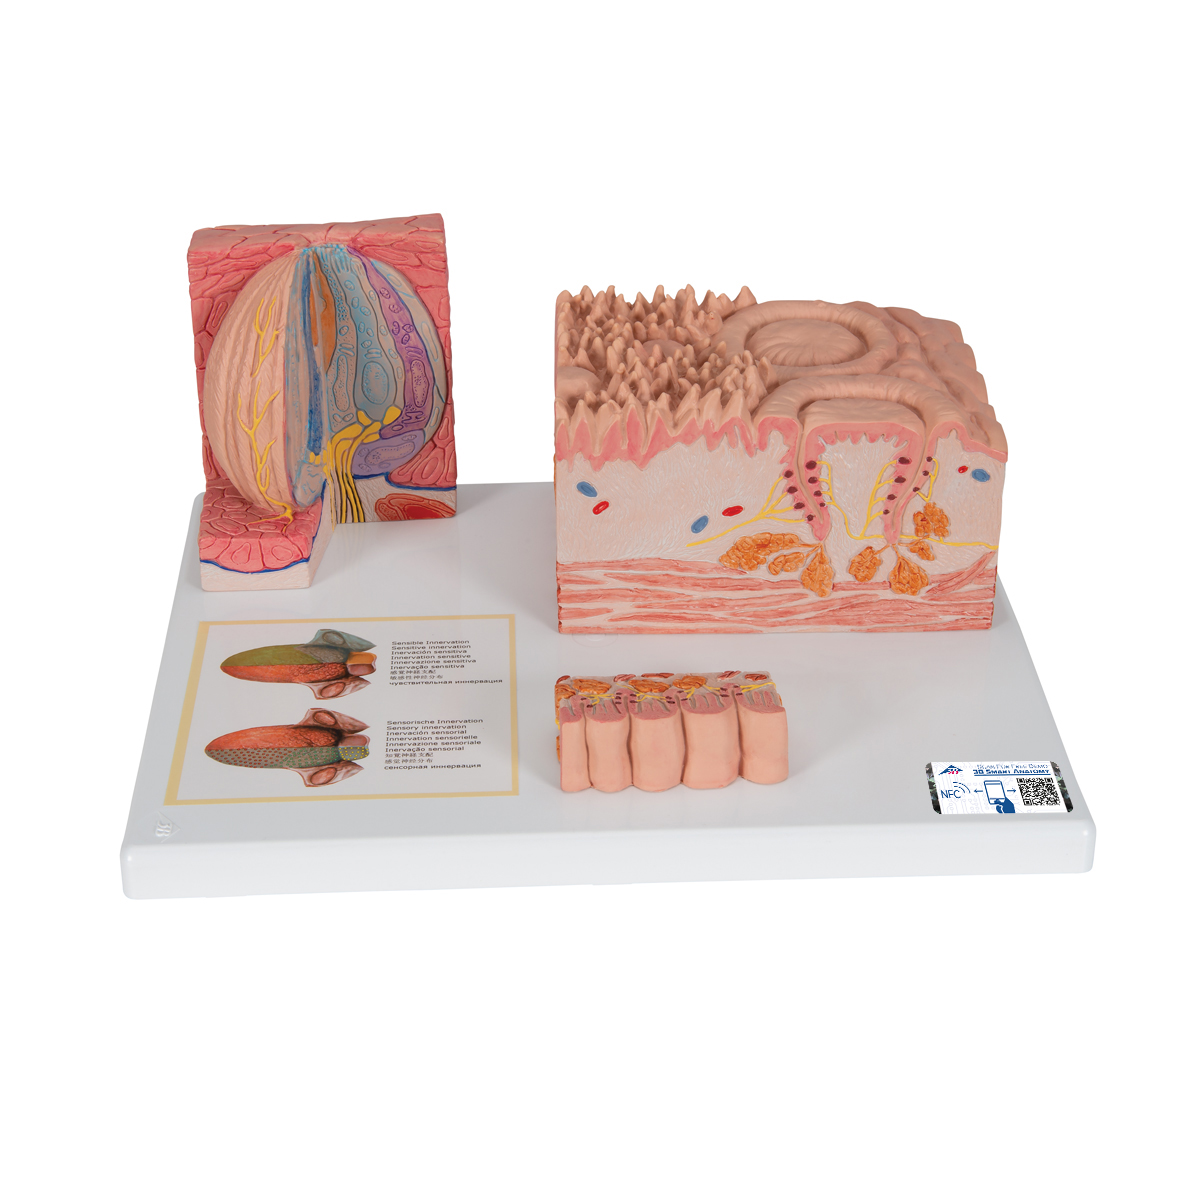 Anatomical Teaching Models - Plastic Human Dental Models ...